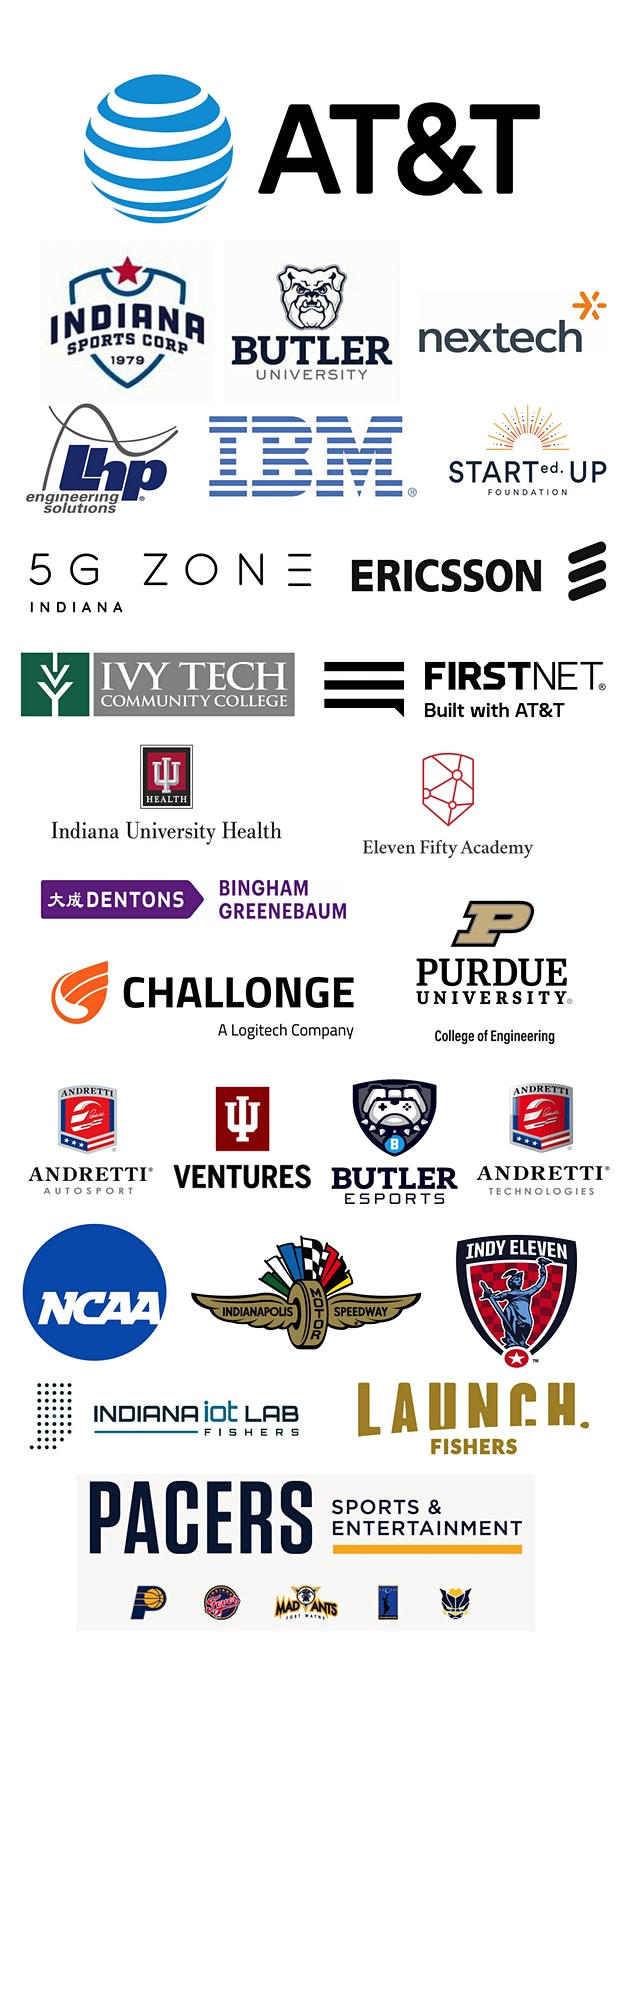 AT&T's 5G Sports Hackathon image